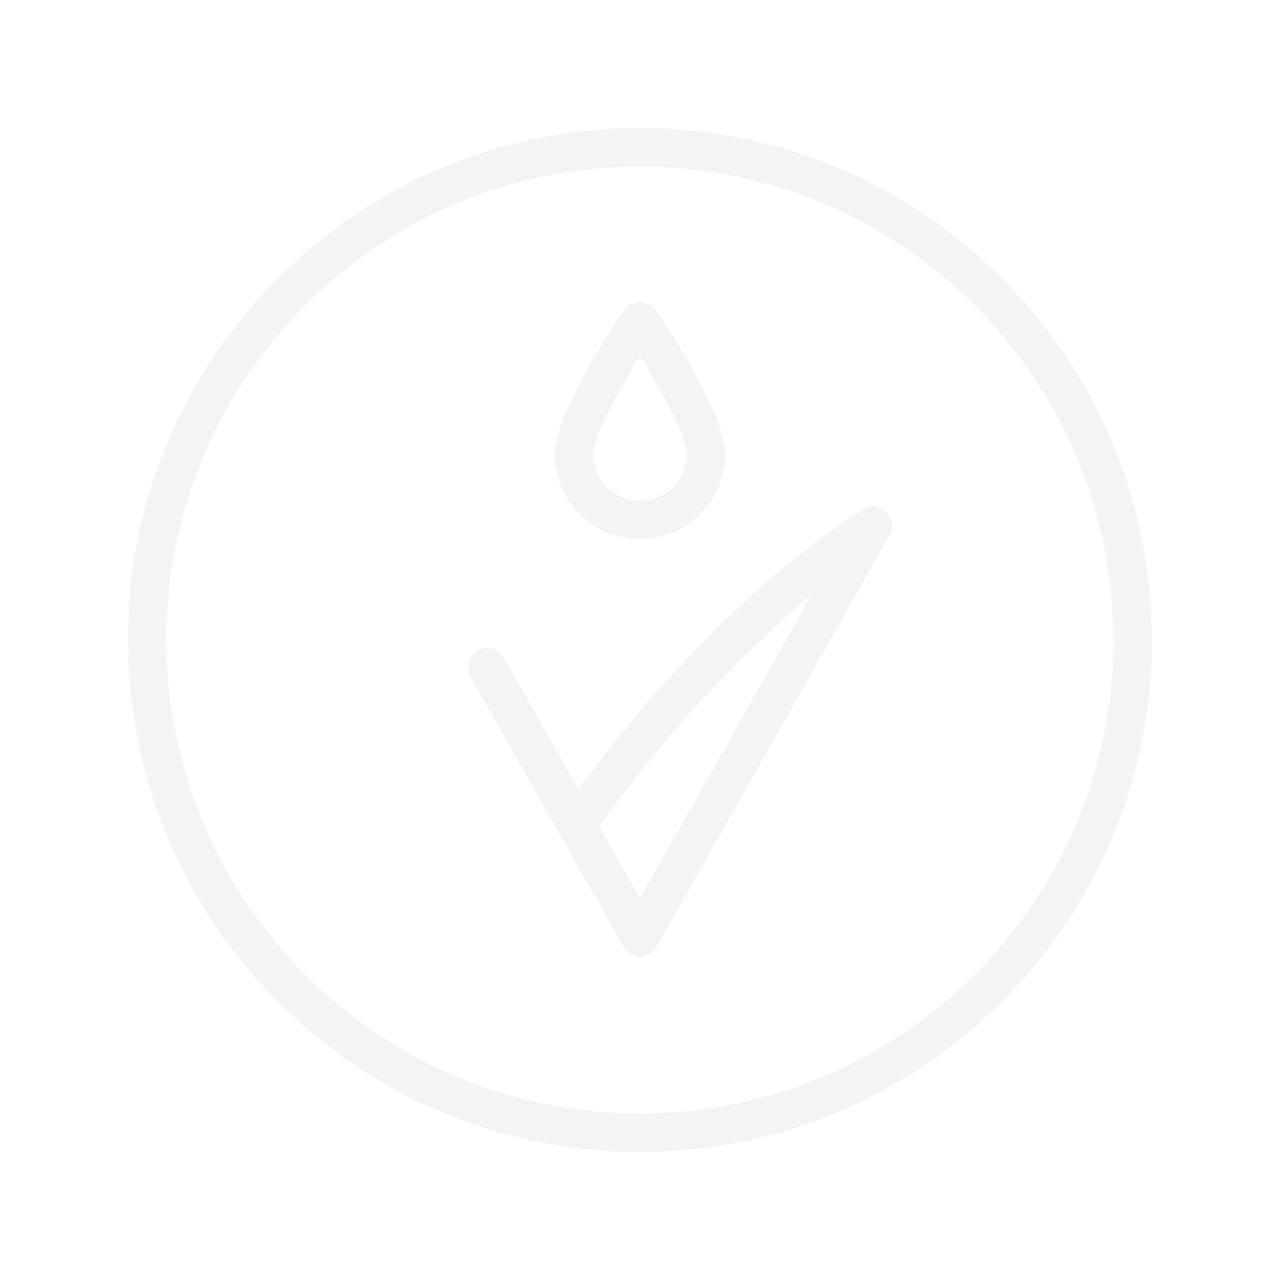 ORLY Breathable Nail Polish Love My Nails 5.3ml | LOVERTE